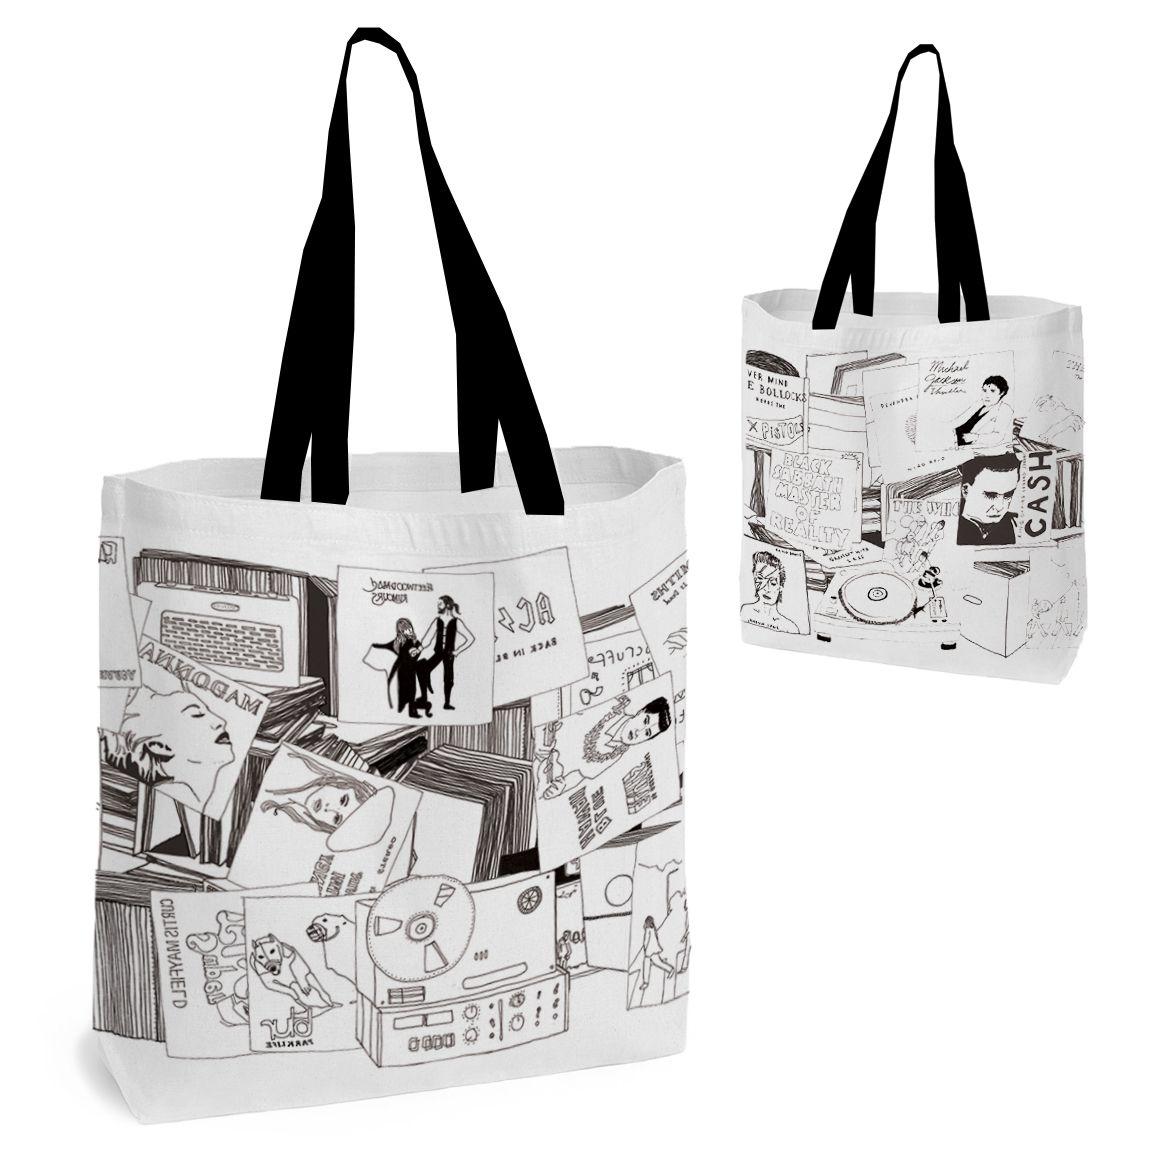 Vinyl Tote Bags With Handles